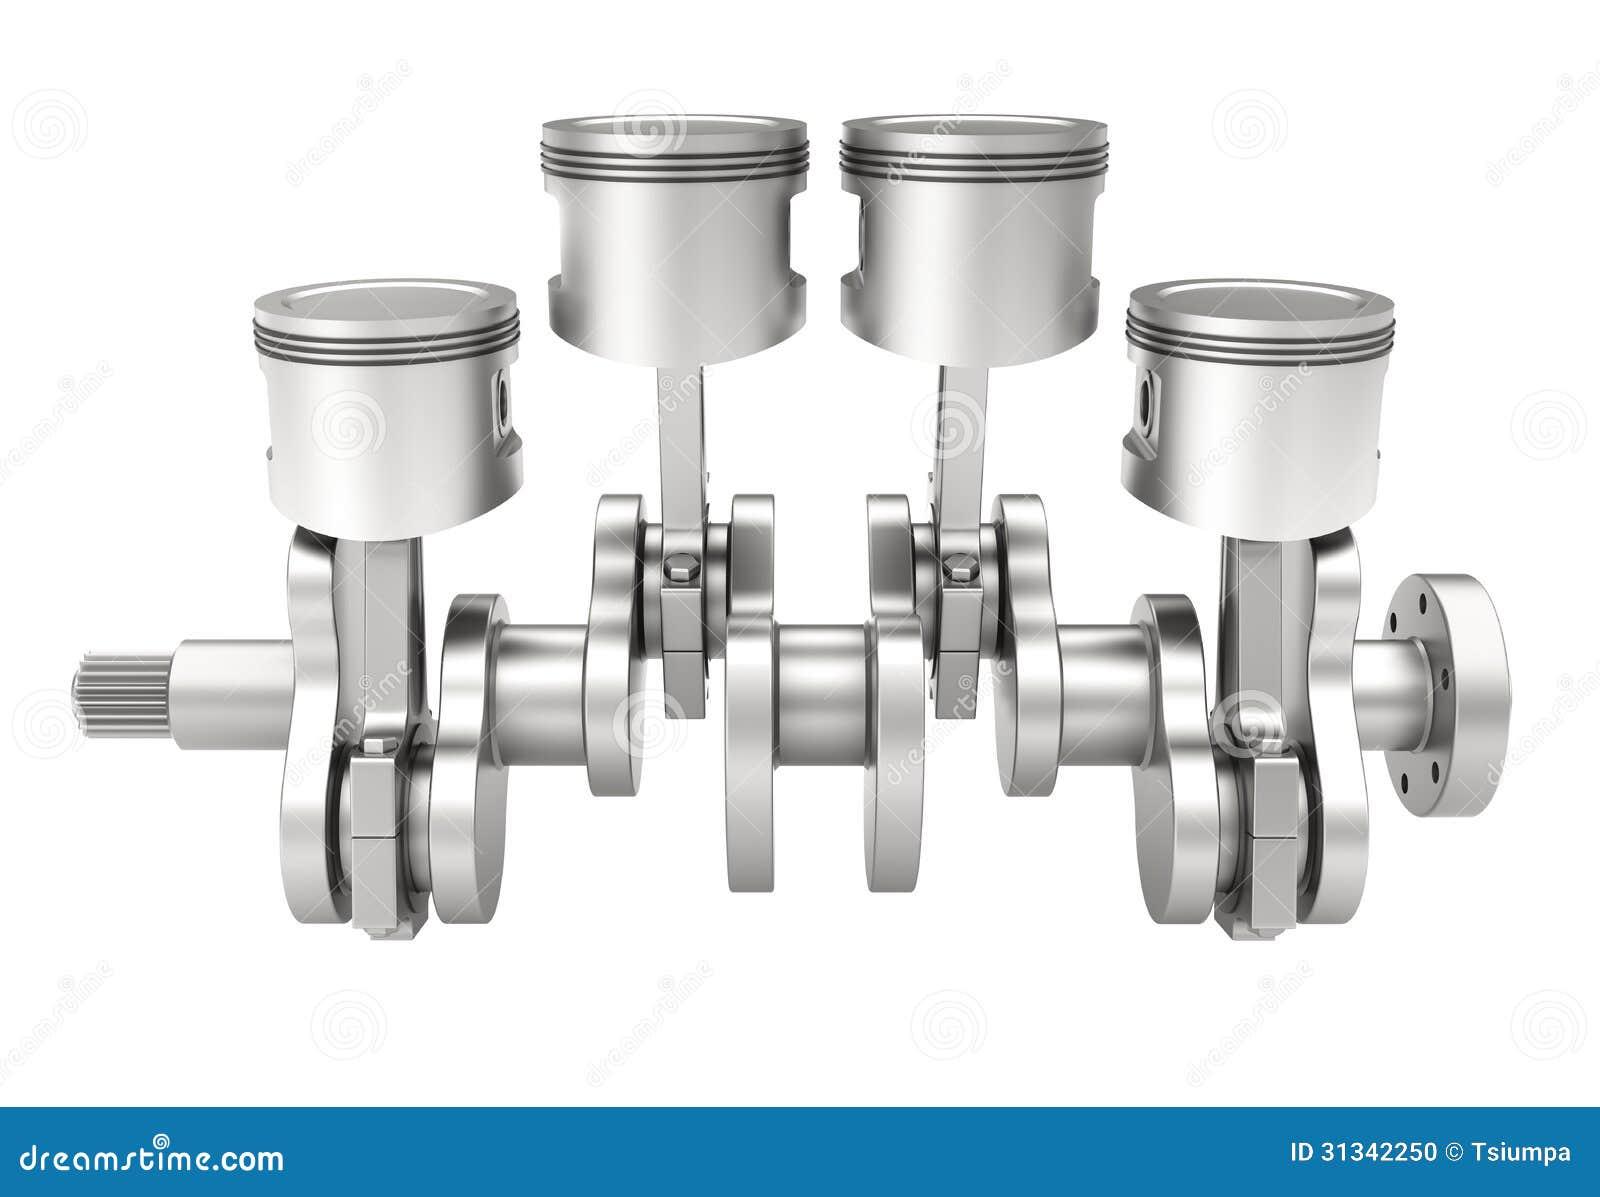 piston in car engine - photo #10